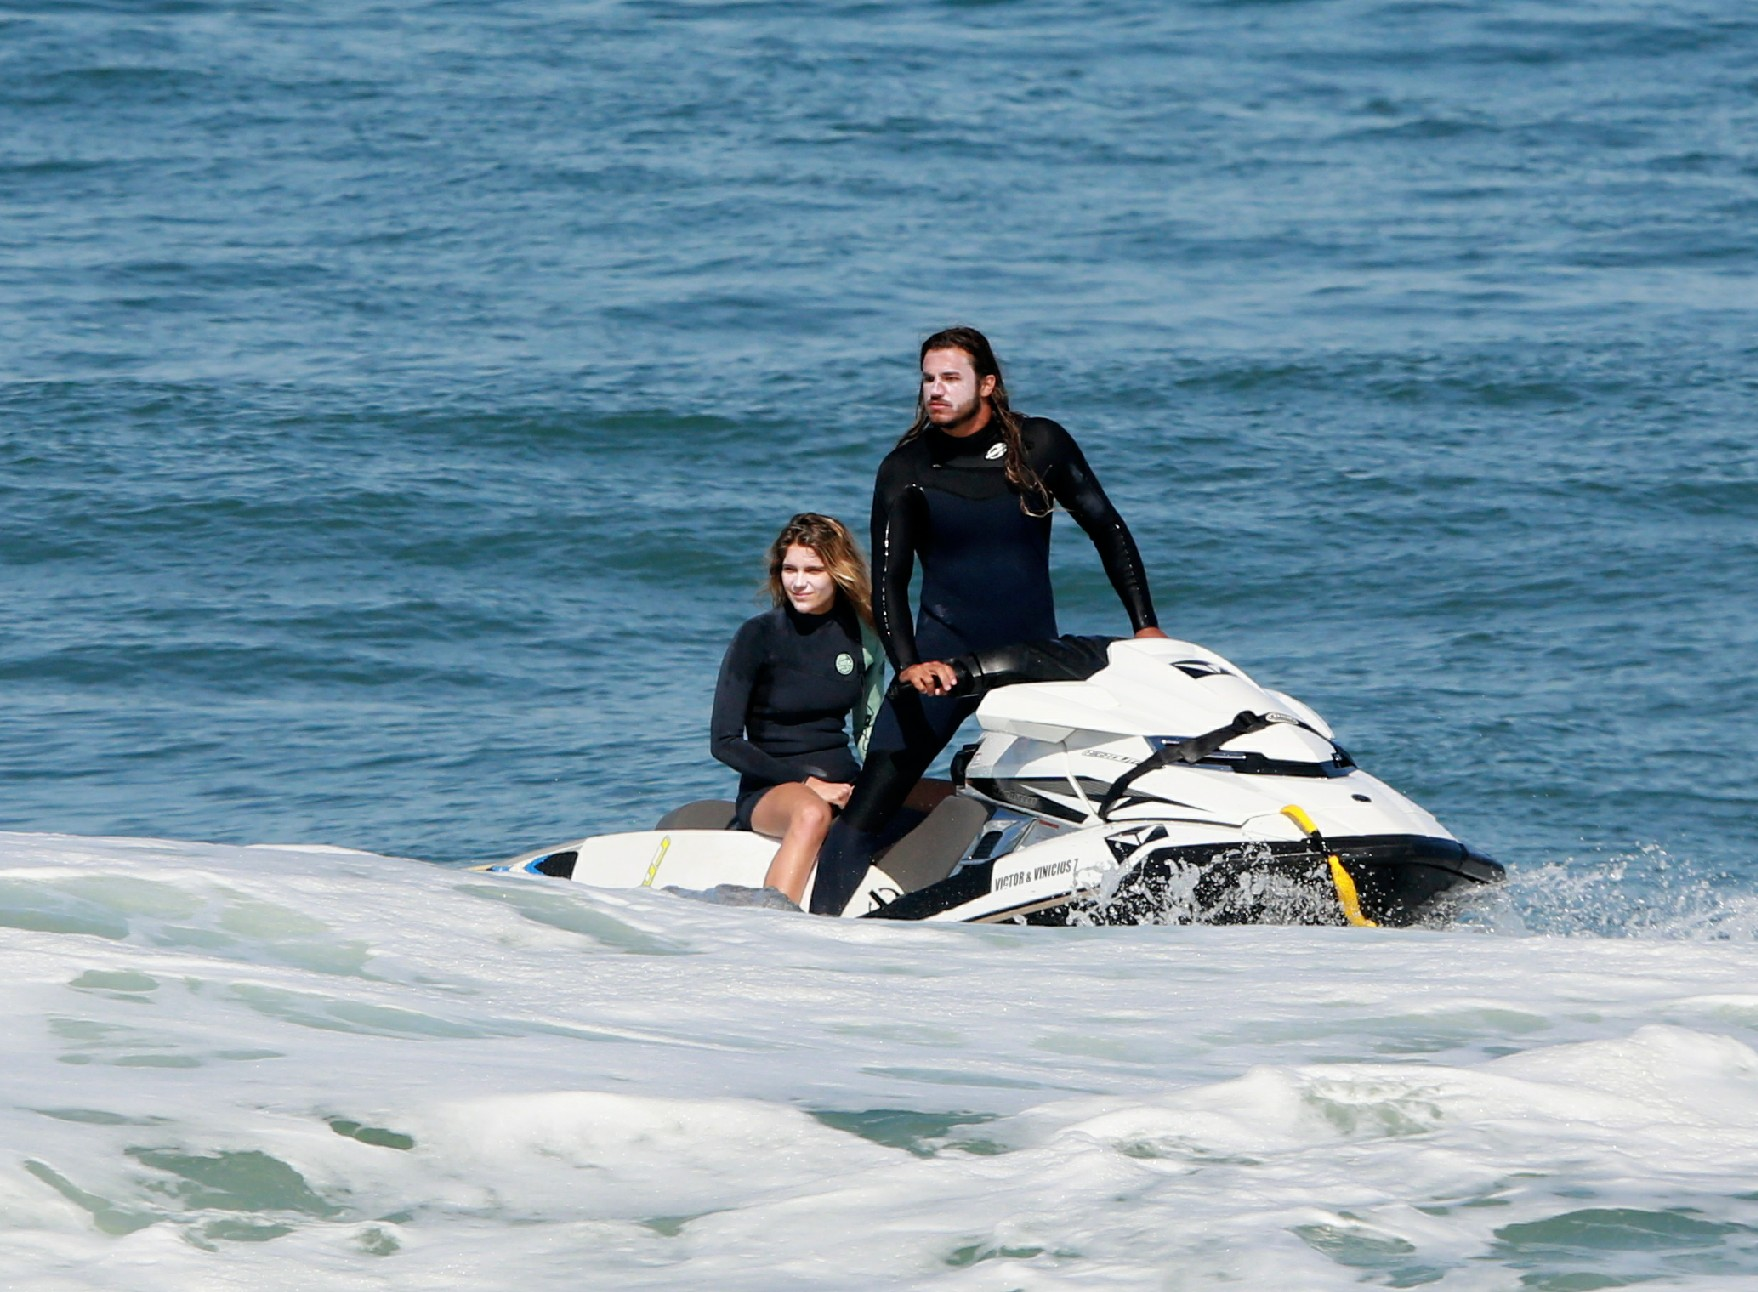 Isabella Santoni surfa (e namora muiiiito) em praia no Rio